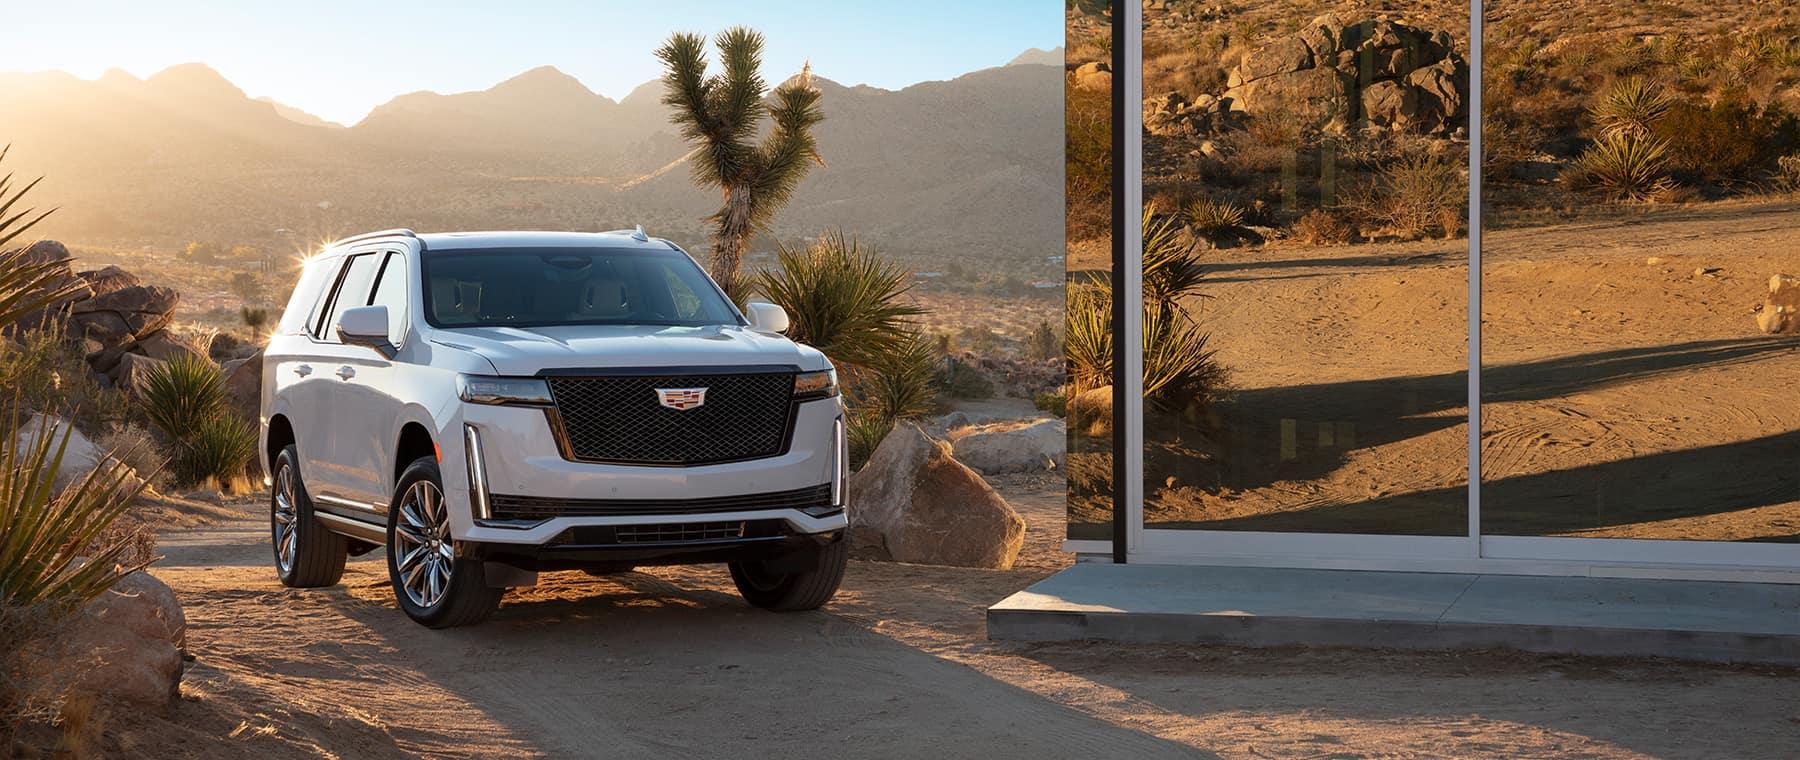 2021 Cadillac Escalade outside of home